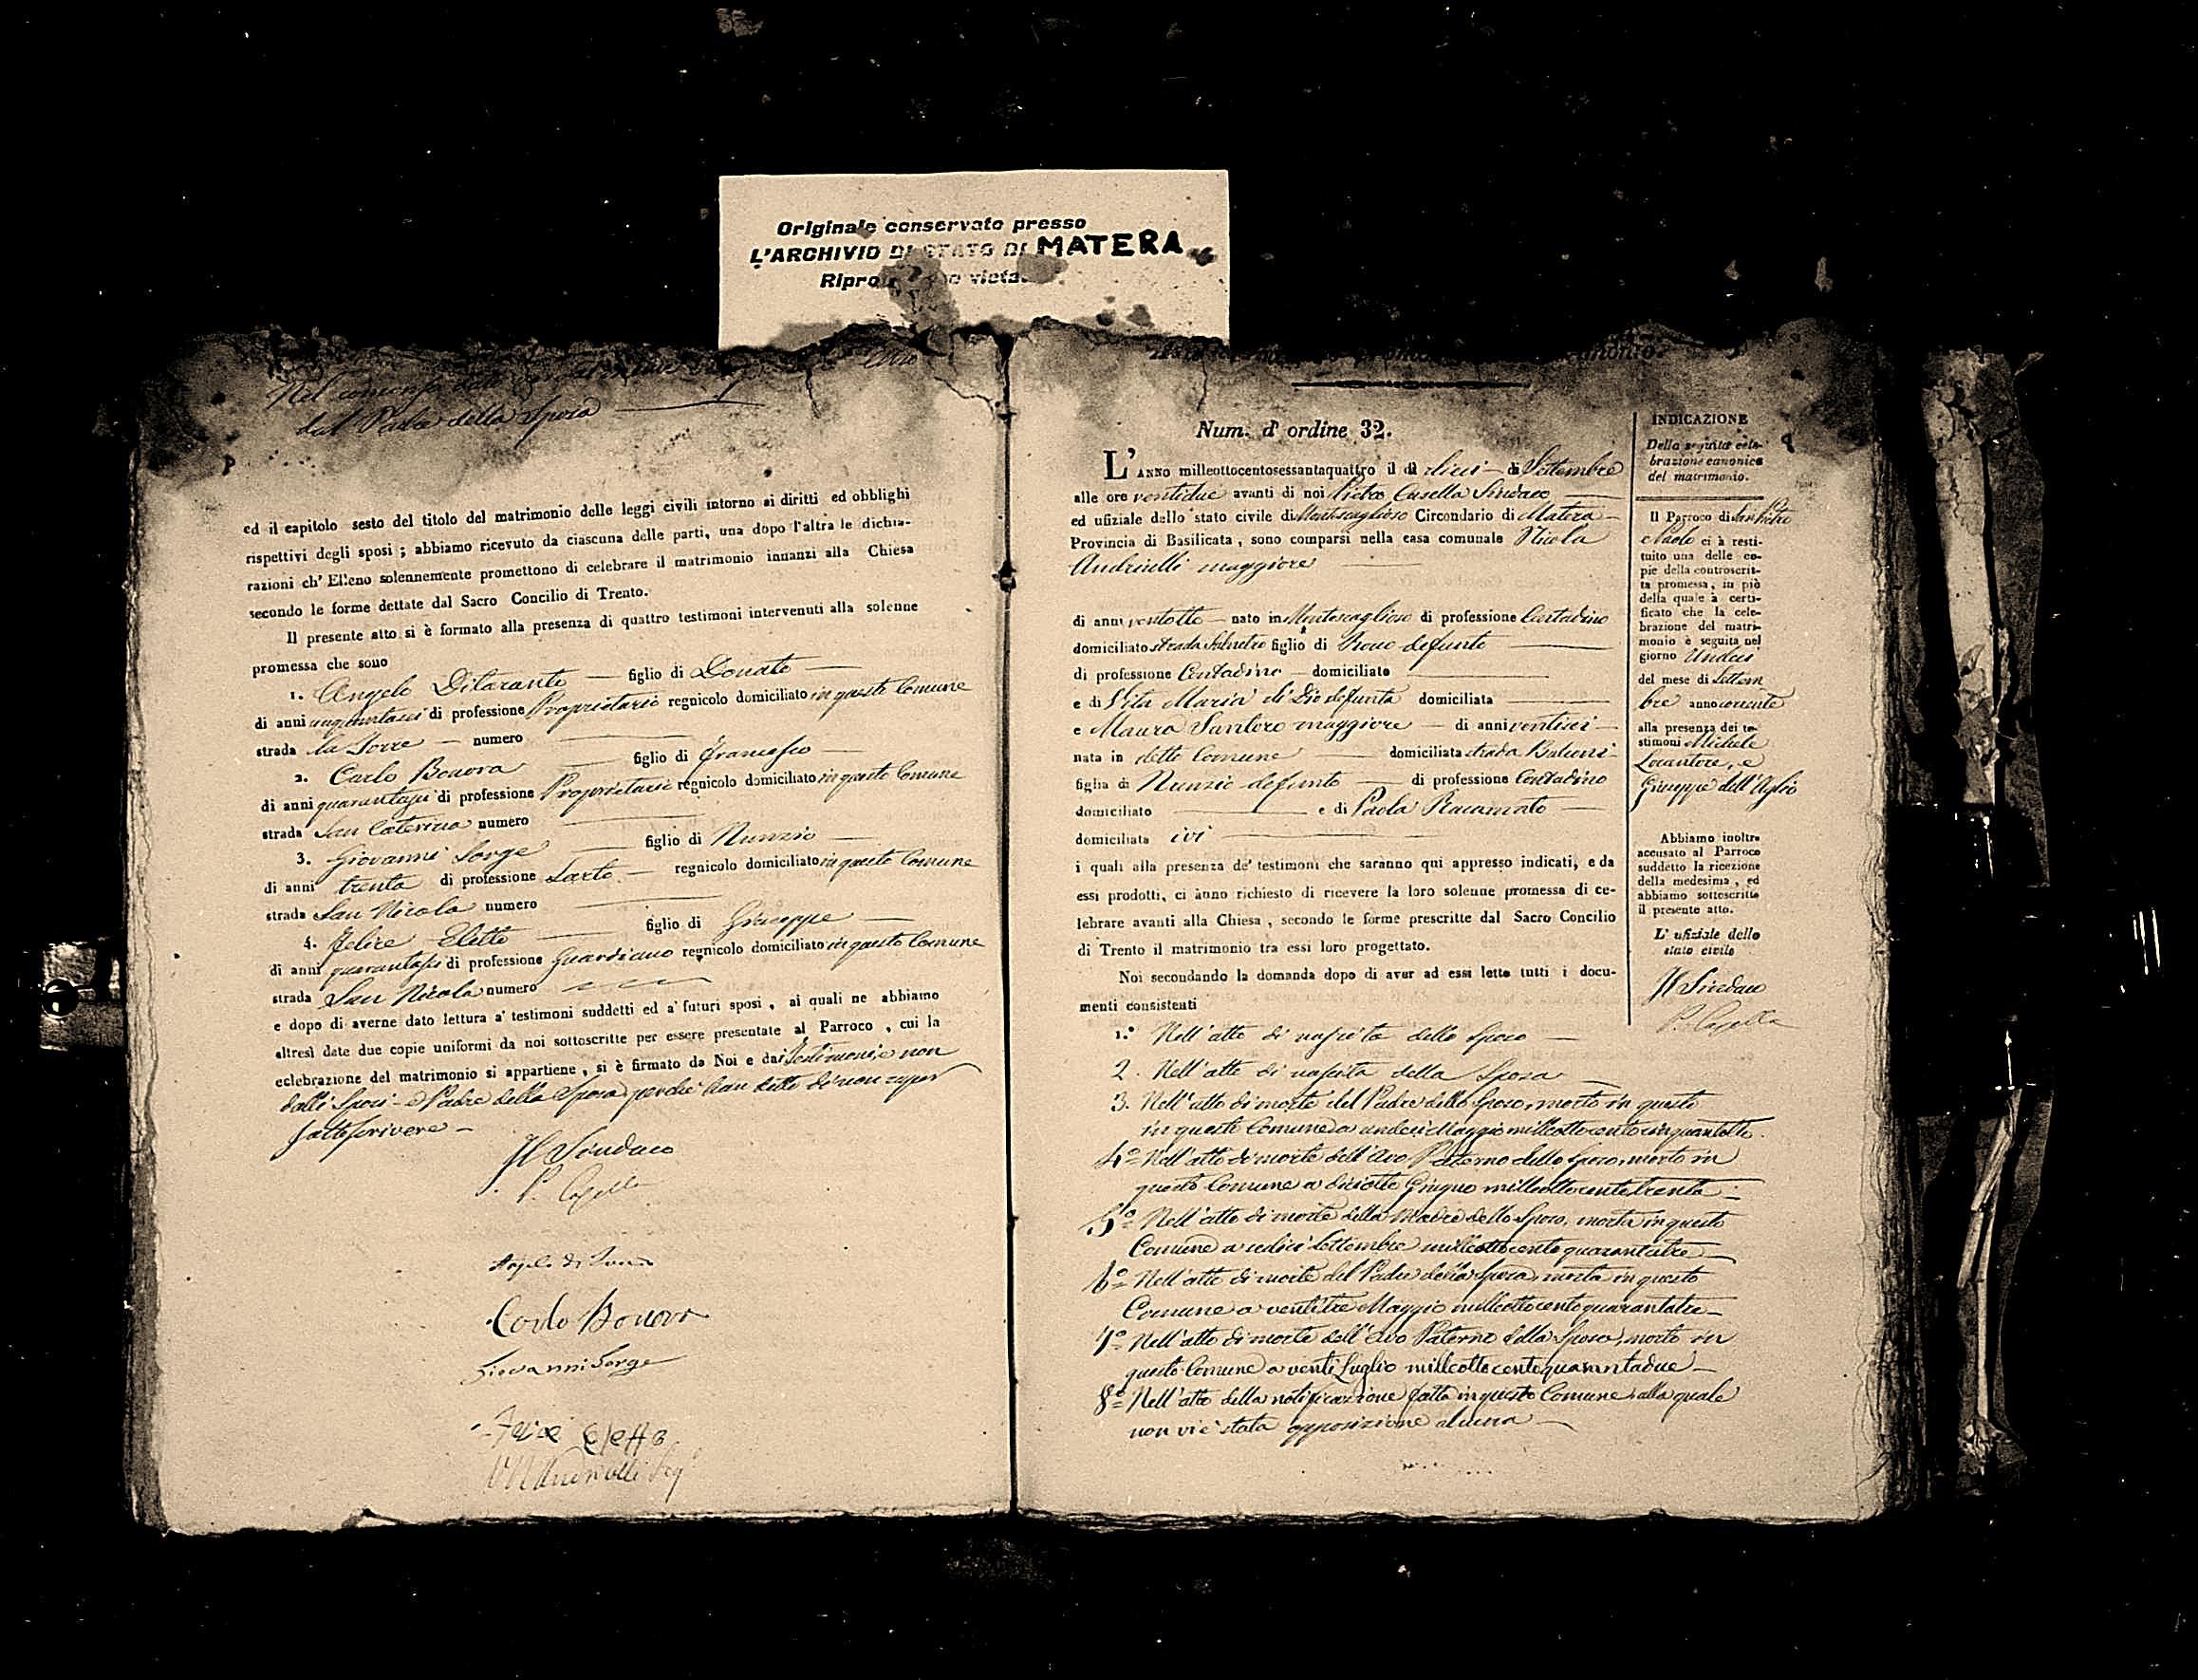 C:\Users\USER\Google Drive\[ - Família Taranto - ]\Docs\Ordem\09 - Certidão de Casamento de Vita Andriulli.1.jpg